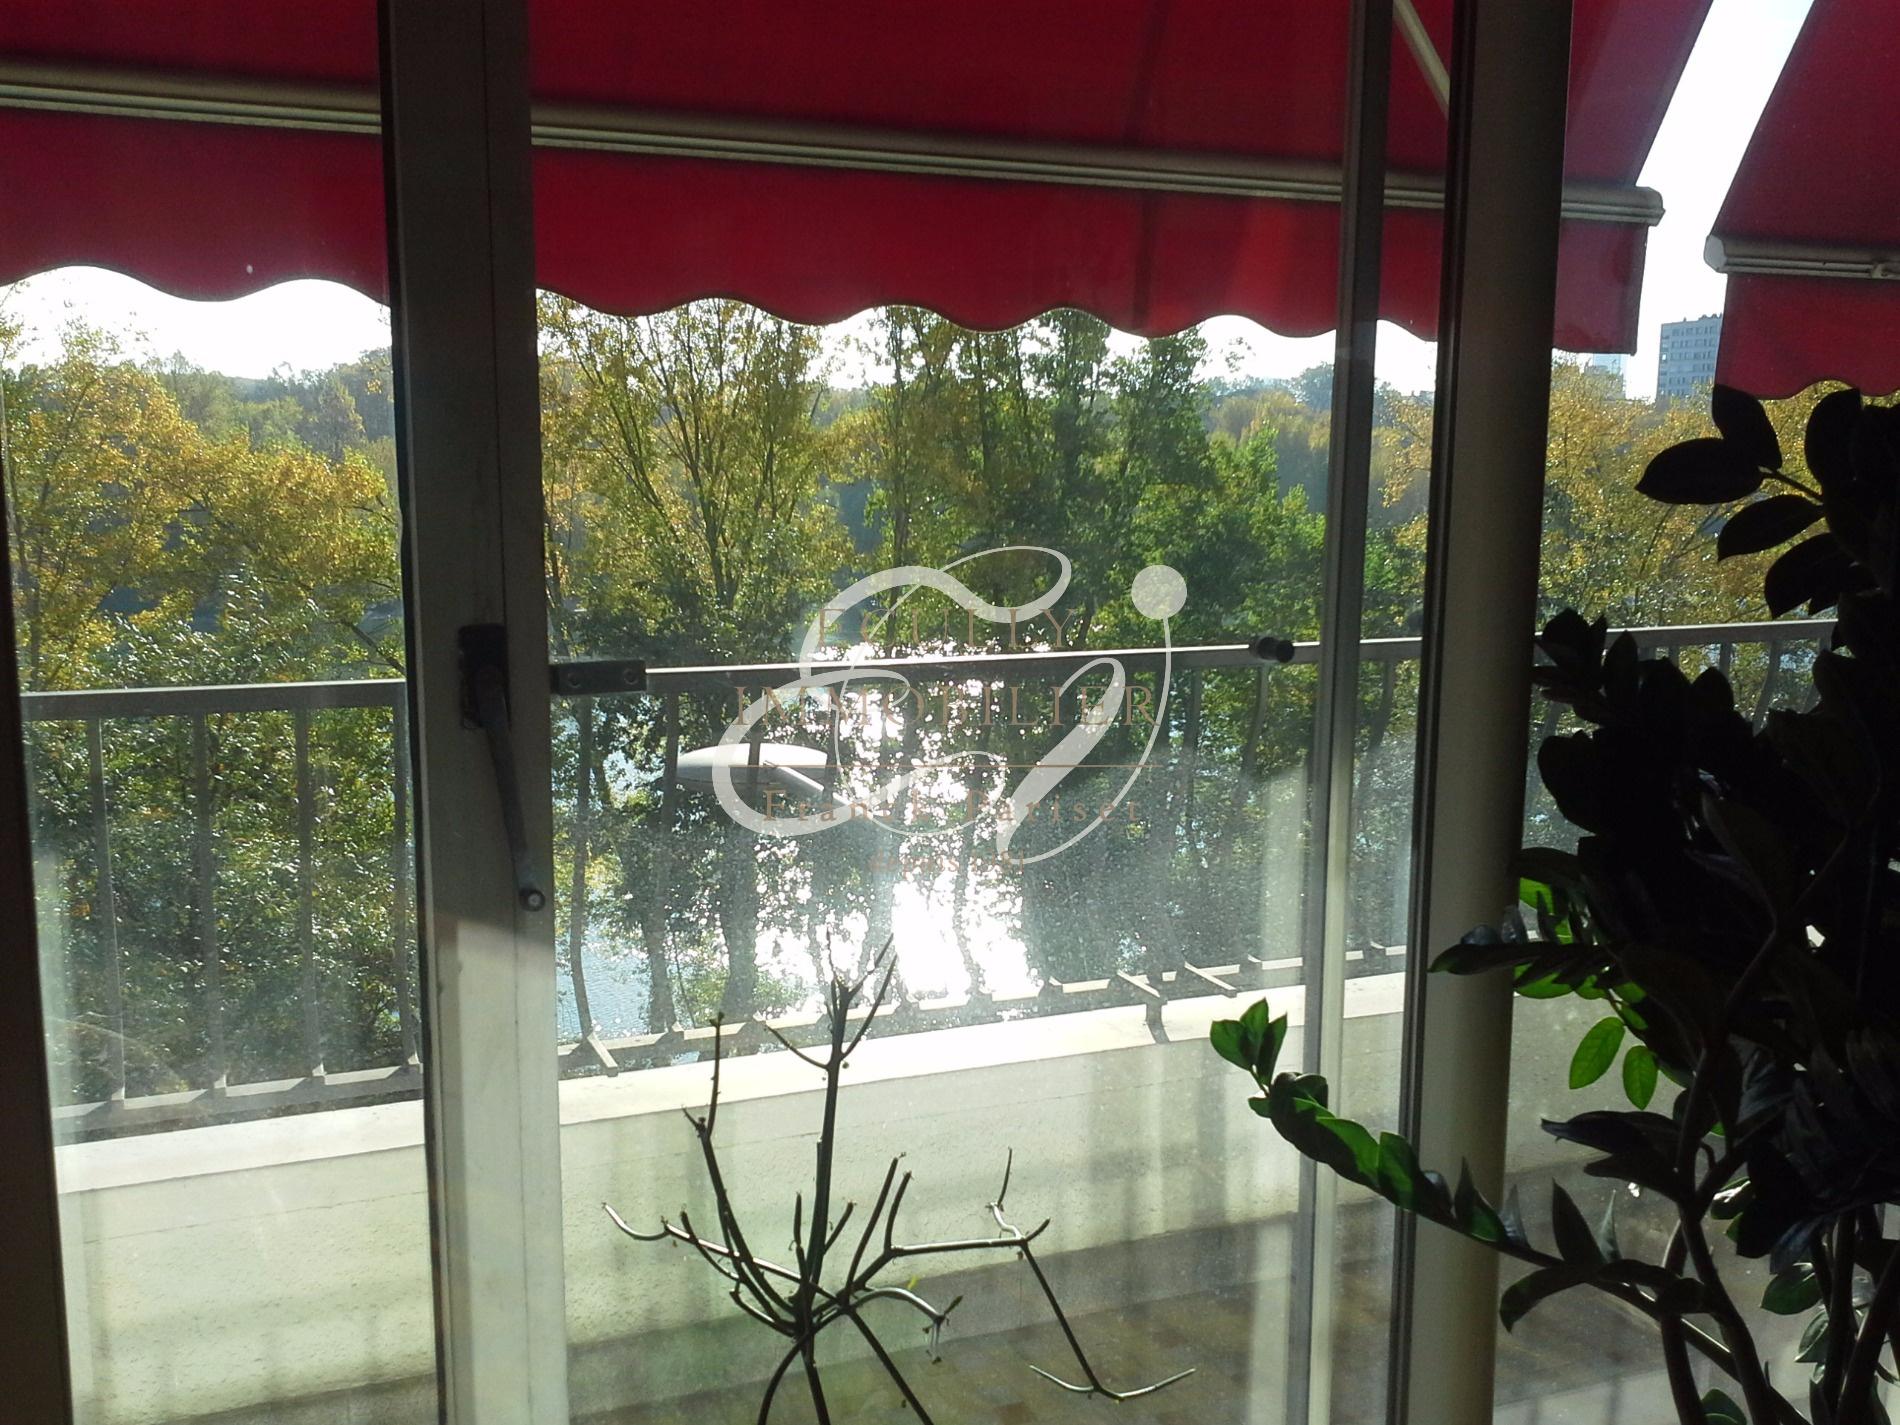 Vente vente ecully 69130 maison 4 chambres for Acheter maison ecully